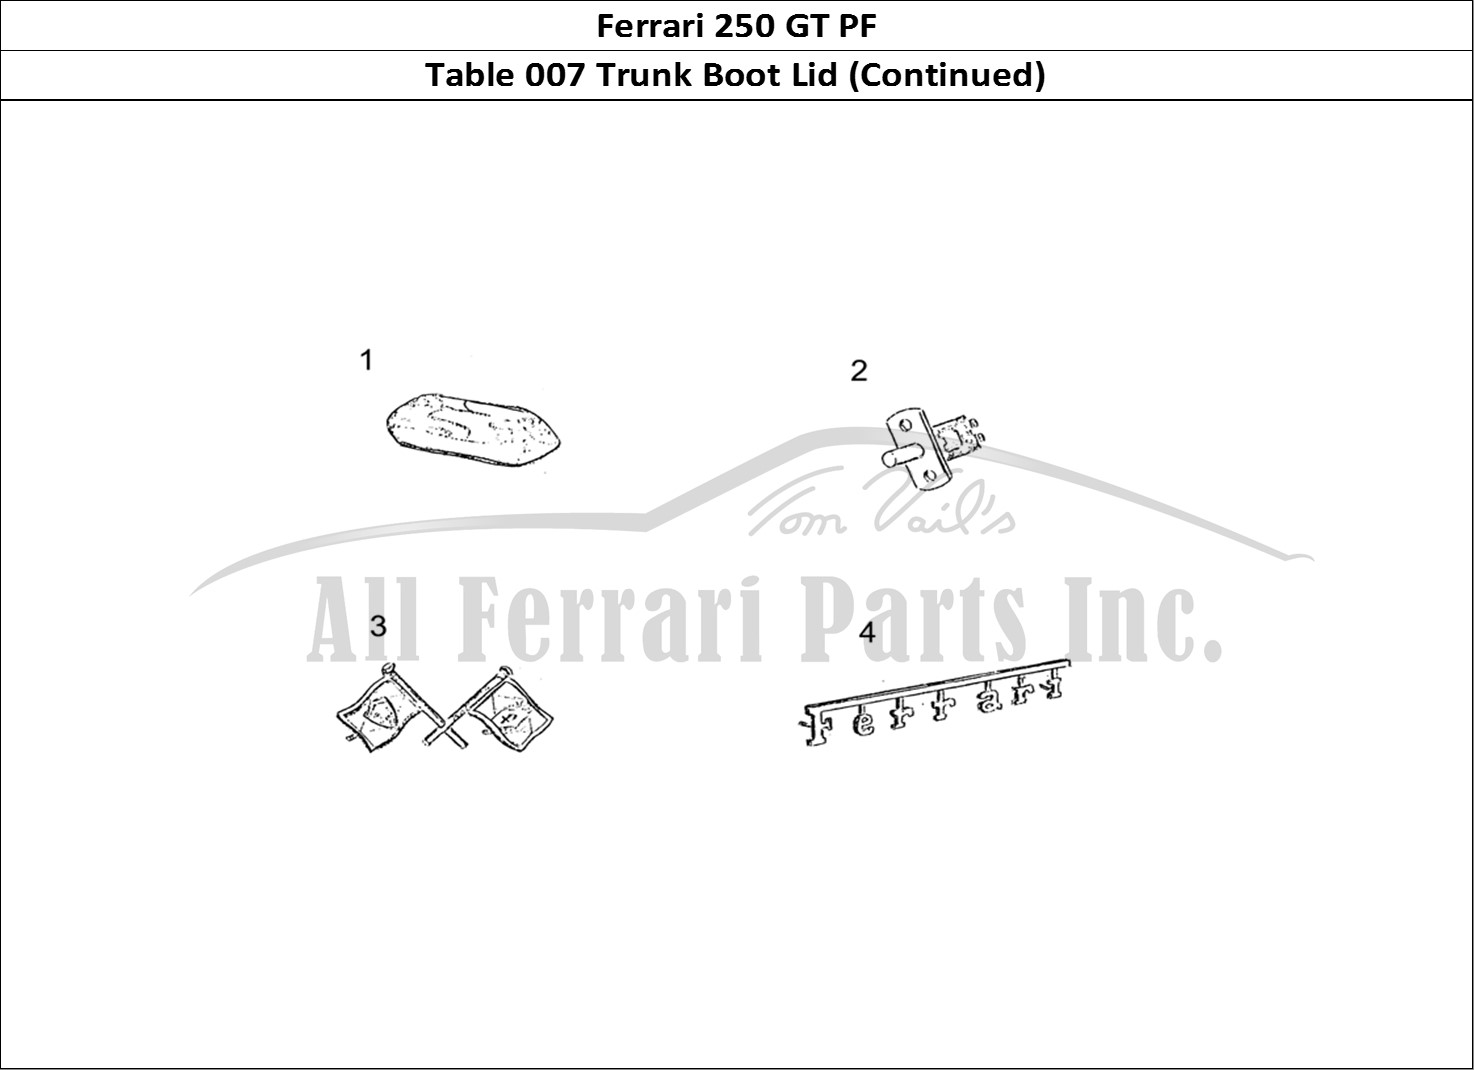 Buy original Ferrari 250 GT PF 007 Trunk Boot Lid